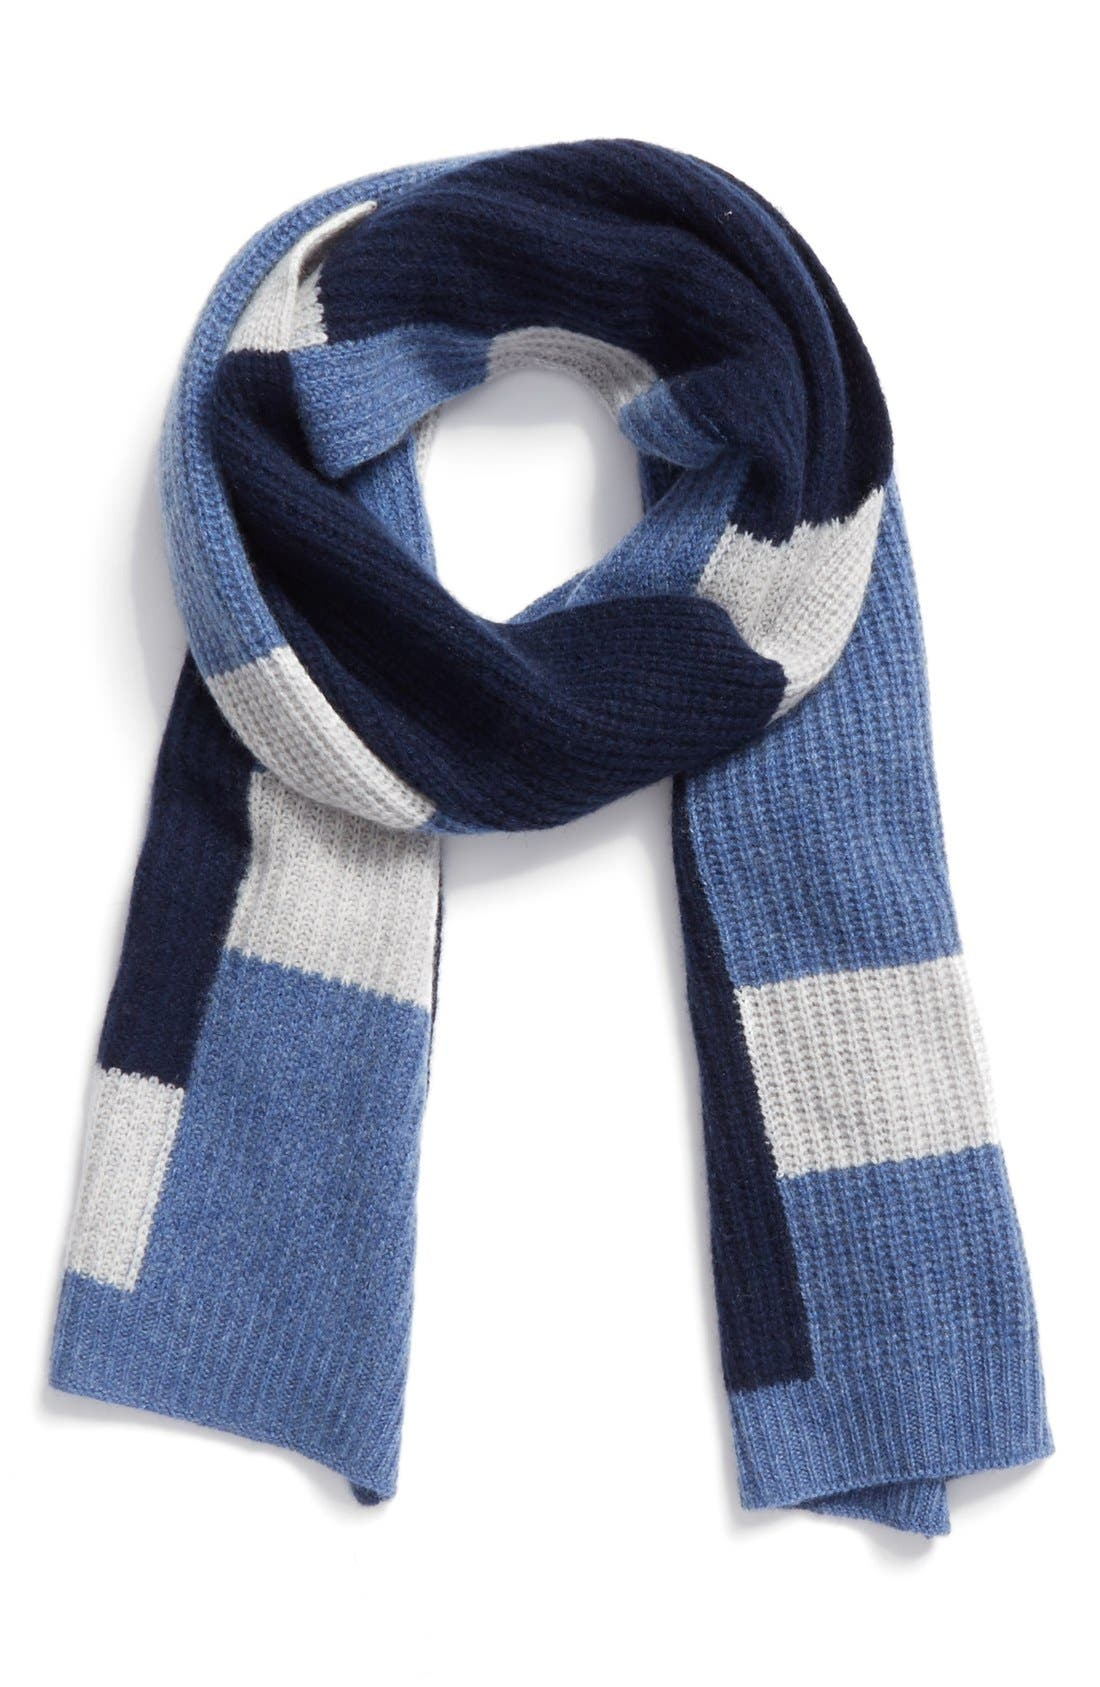 Alternate Image 1 Selected - Halogen® Colorblock Knit Cashmere Scarf